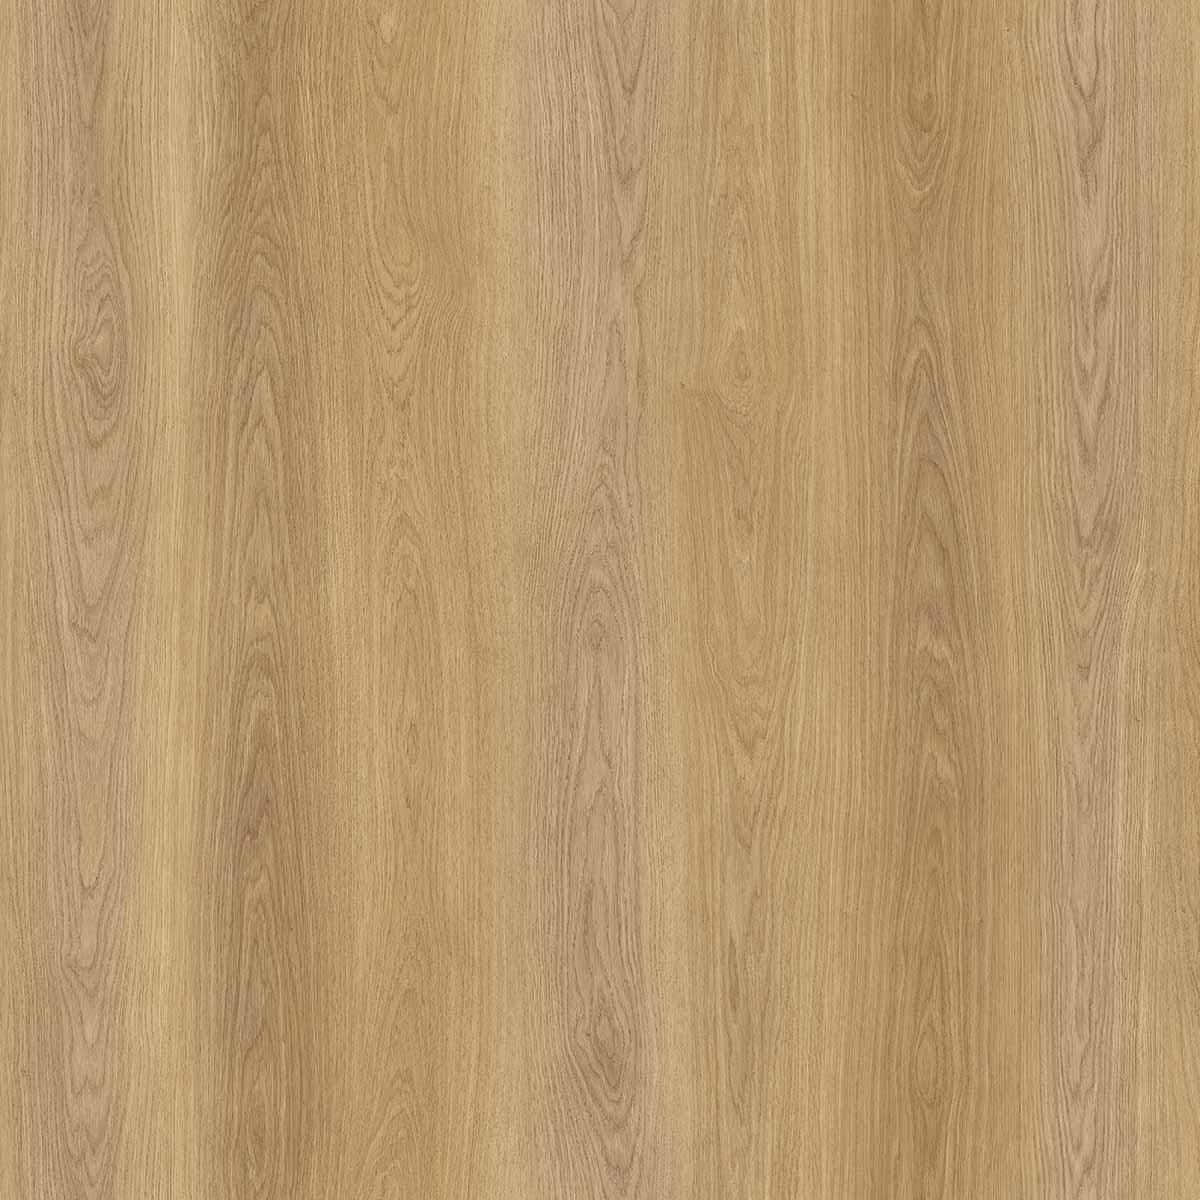 Pavimento in sughero Redwood Forest Oak